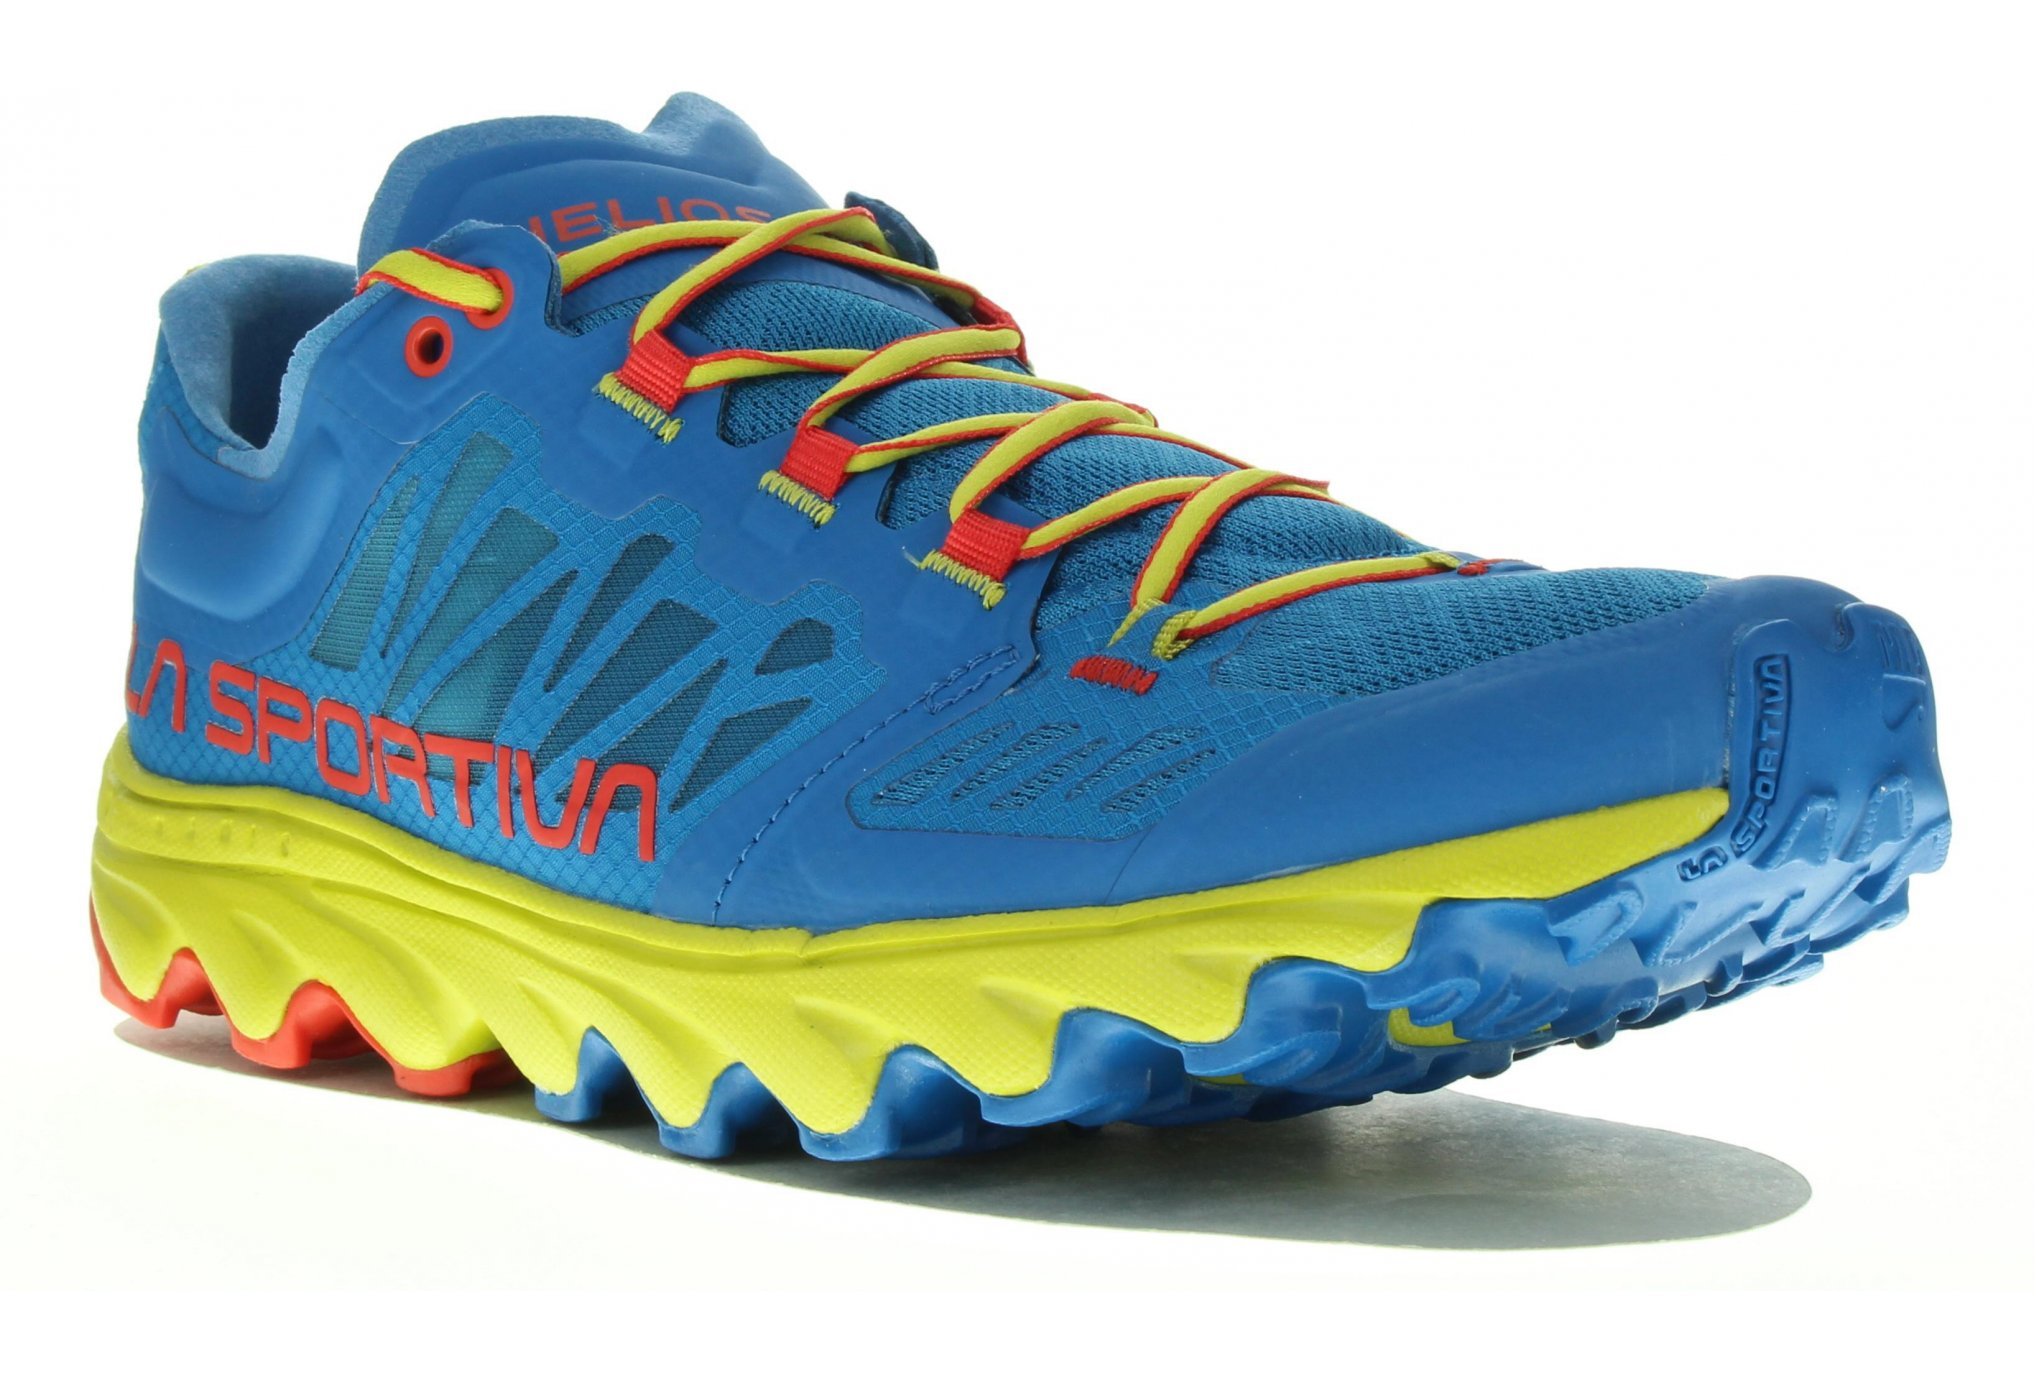 La Sportiva Helios III M Chaussures homme